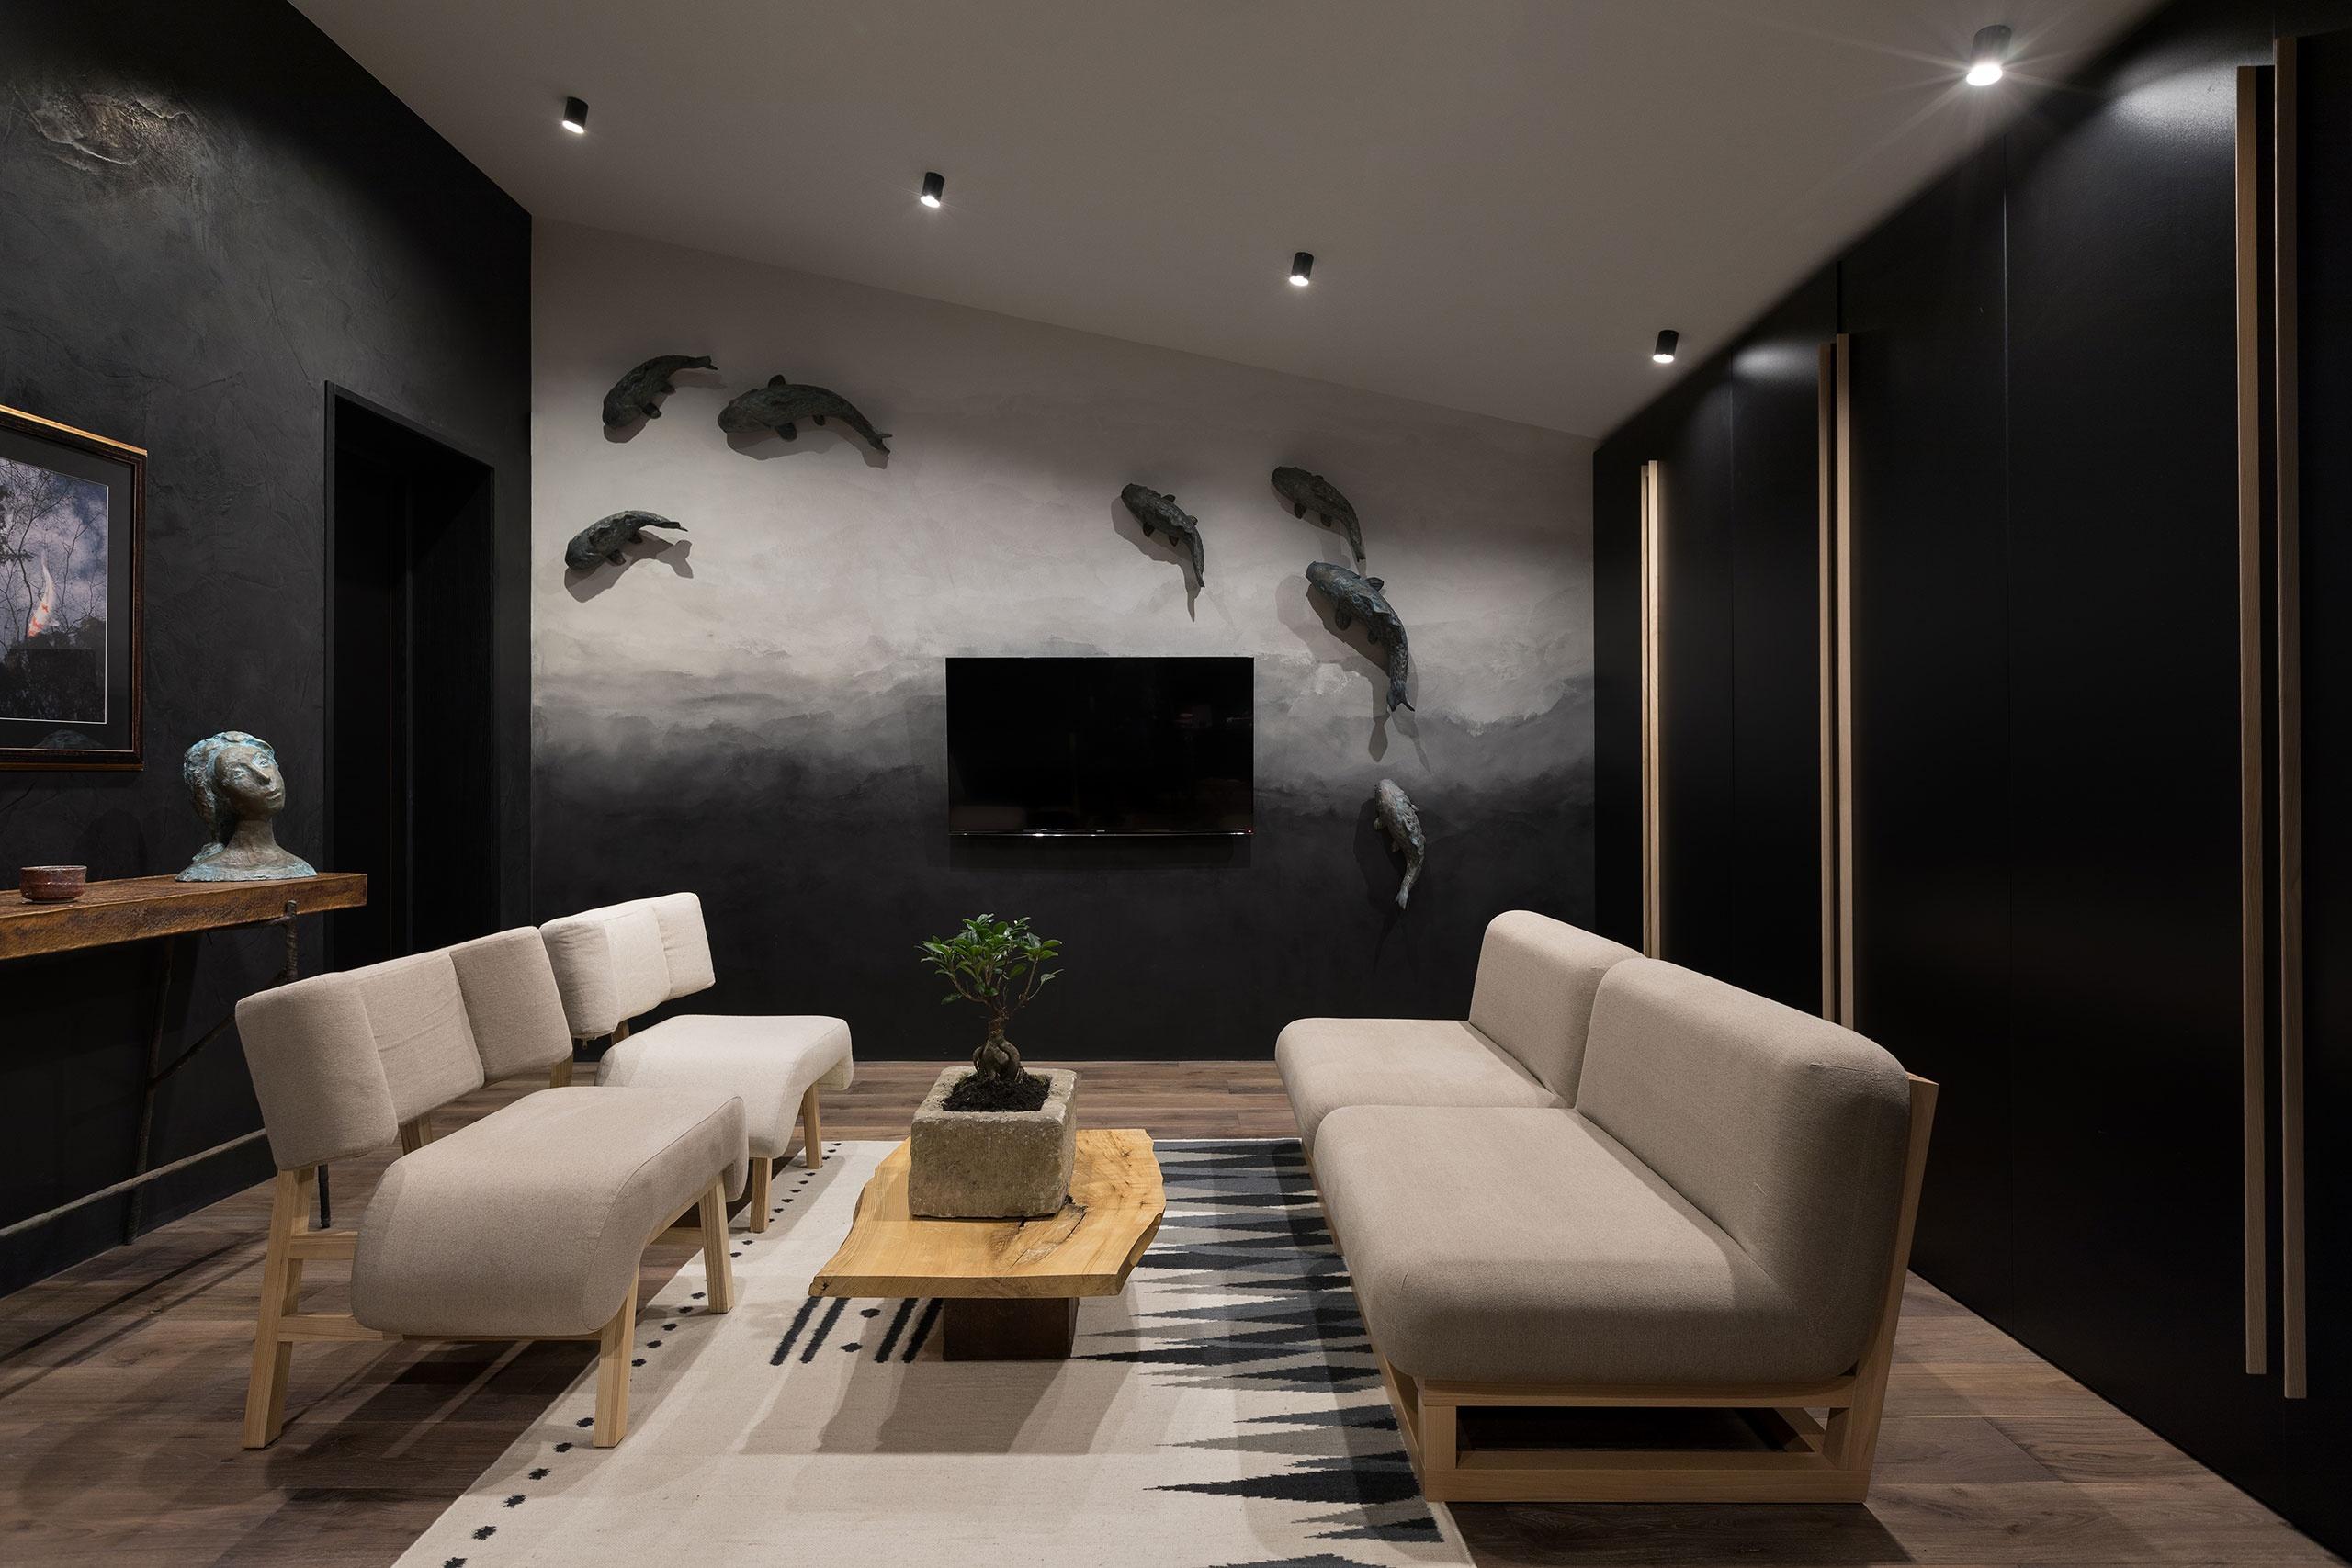 p3_wabi_sabi_apartment_by_sergey_makhno_architects_yatzer